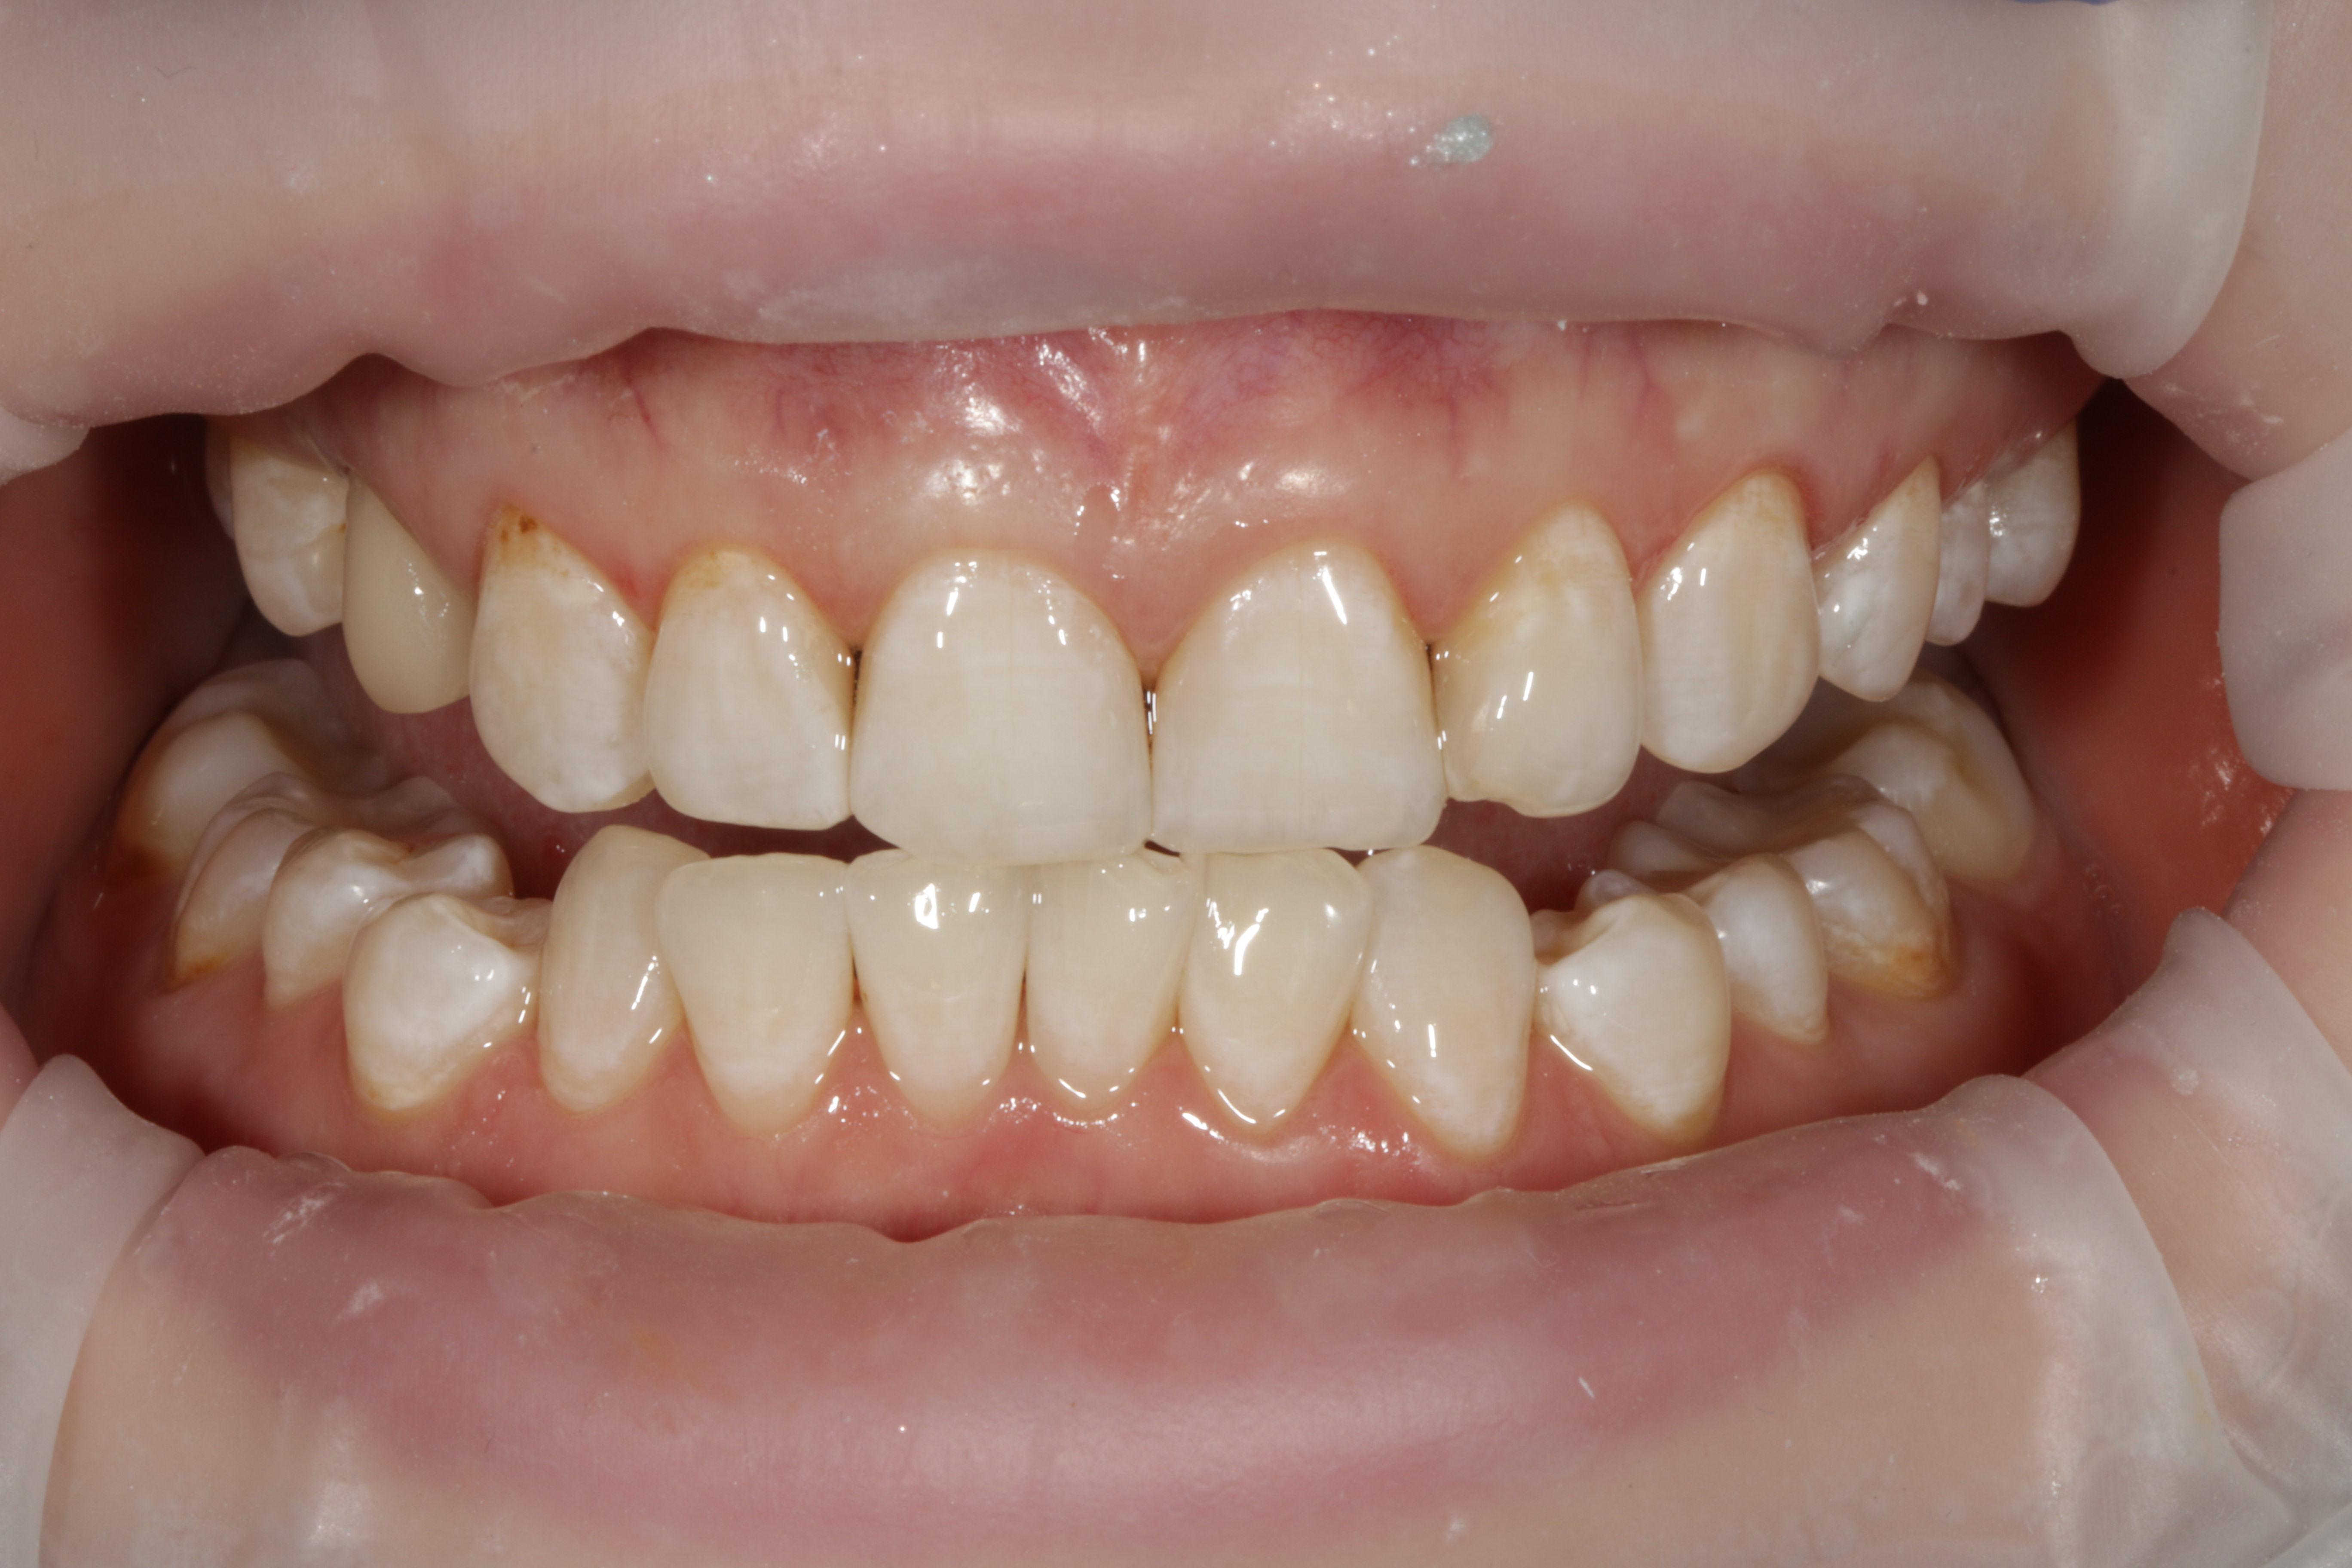 Само отбеливание зубов заняло около 40 минут в кресле и дало нам осветление на 5 тонов